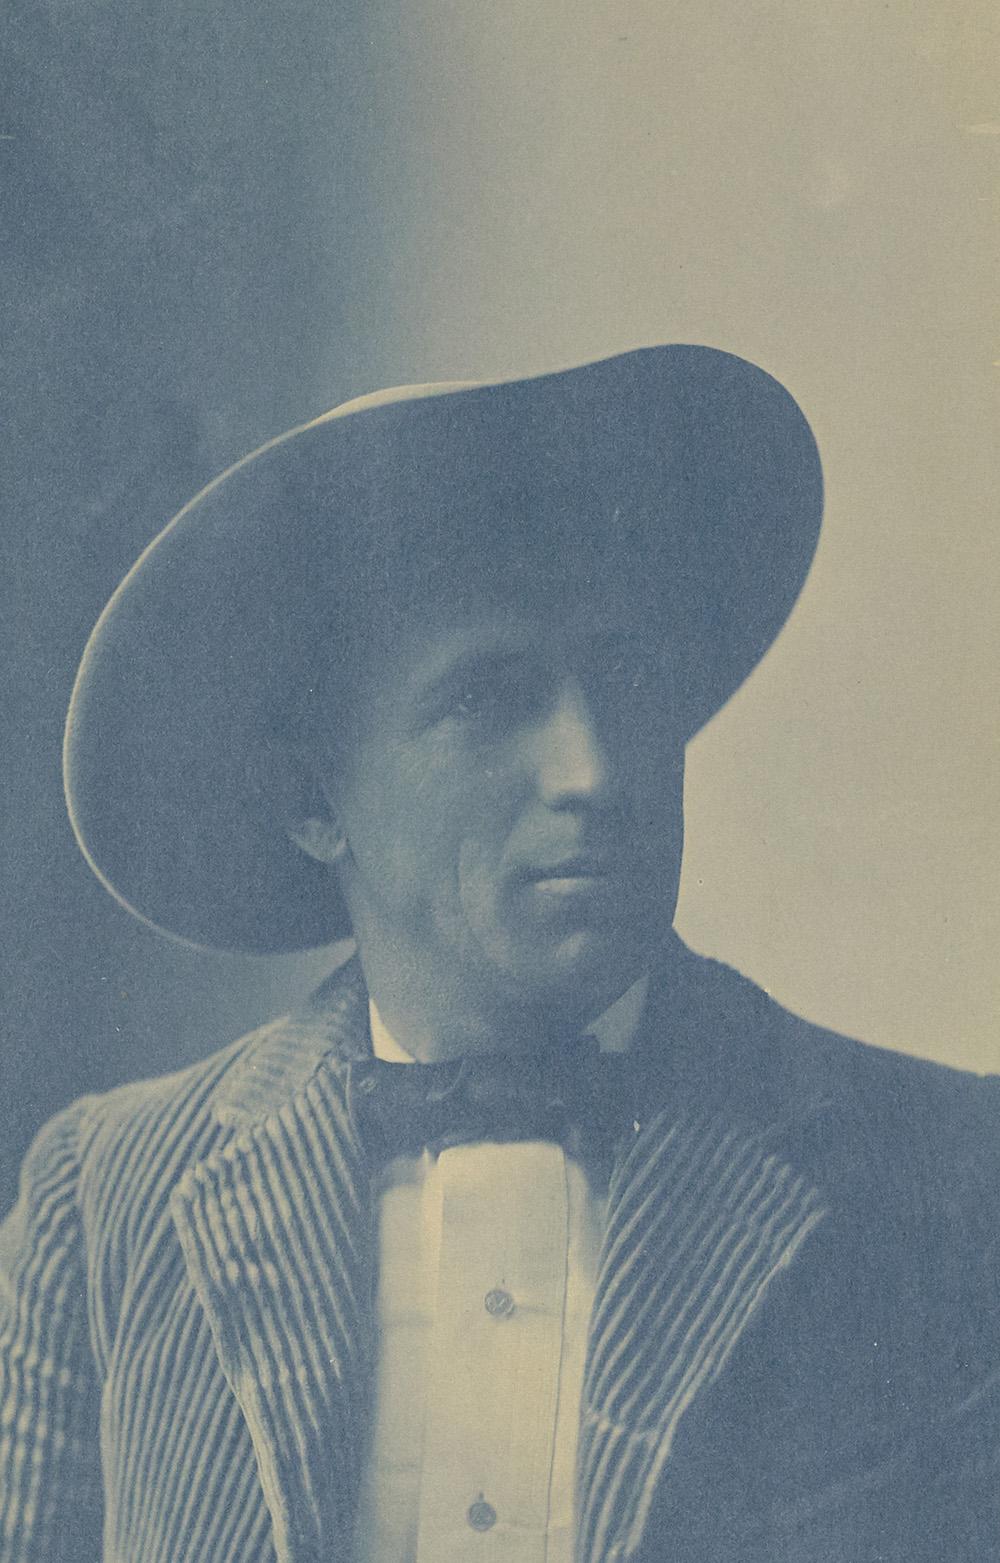 Portrait of Charles Fletcher Lummis, 1897. Photograph by Aemilian Scholl. The J. Paul Getty Museum.